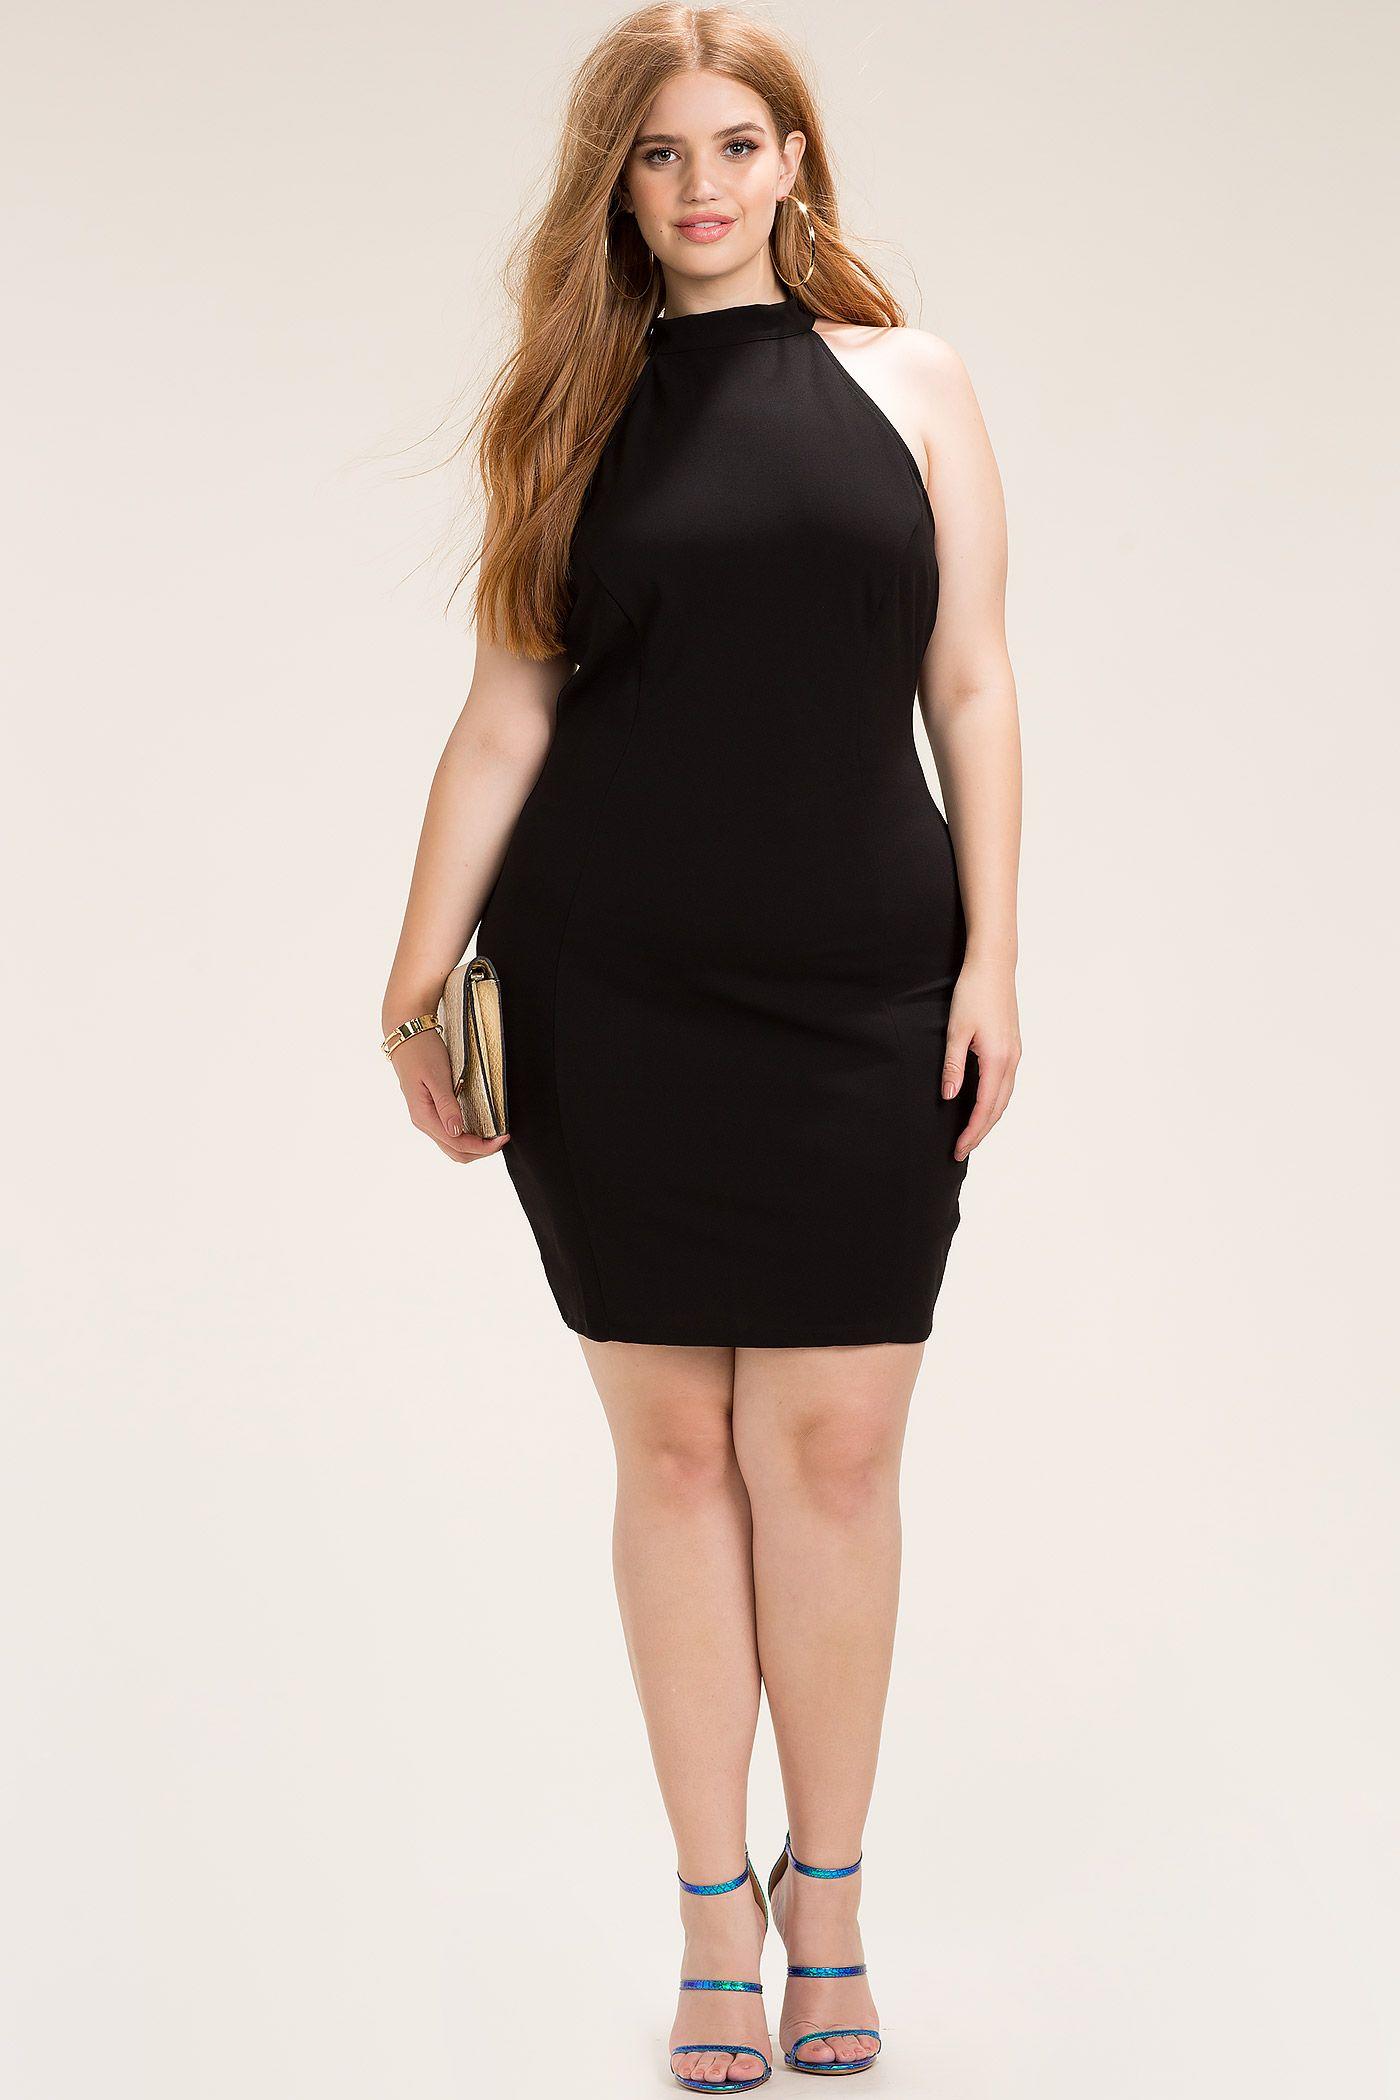 Women\'s Plus Size Bodycon Dresses | Mesh Crush Halter ...